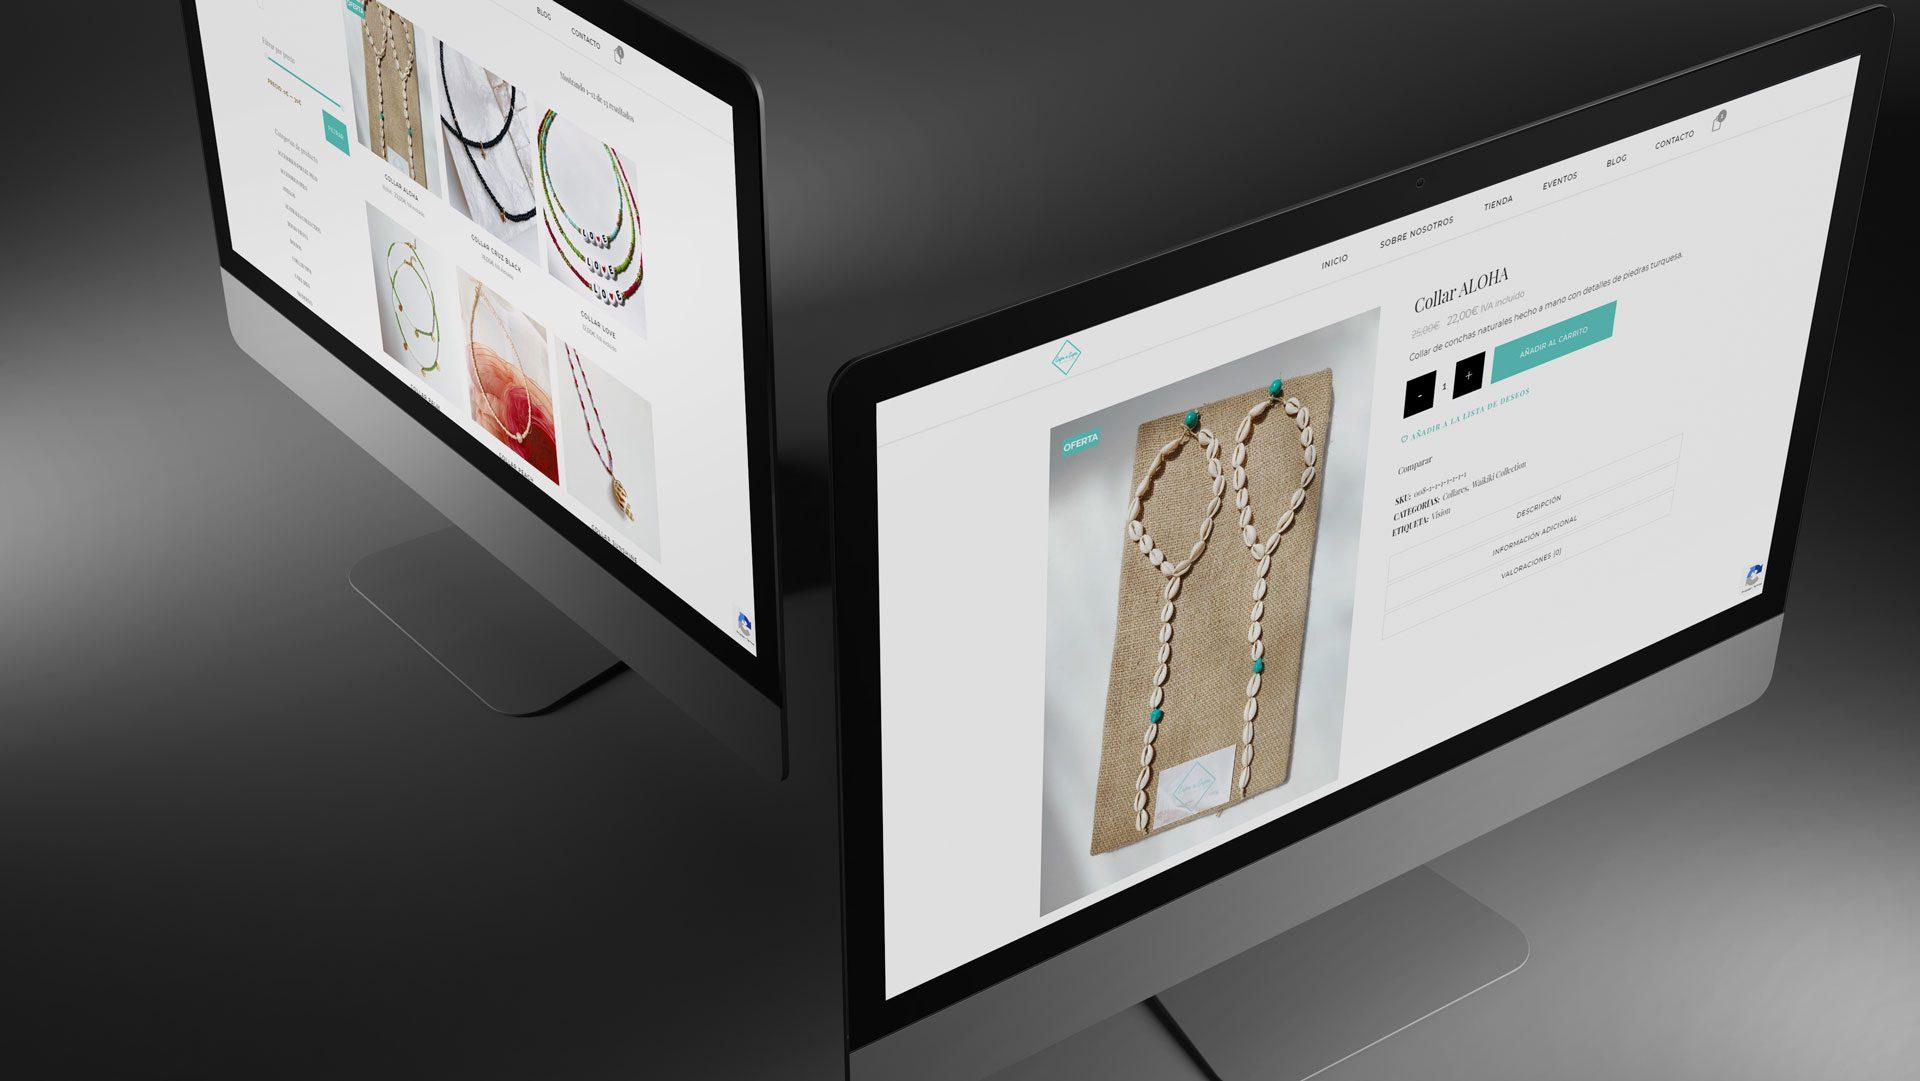 mockup capa a capa categorias productos 1